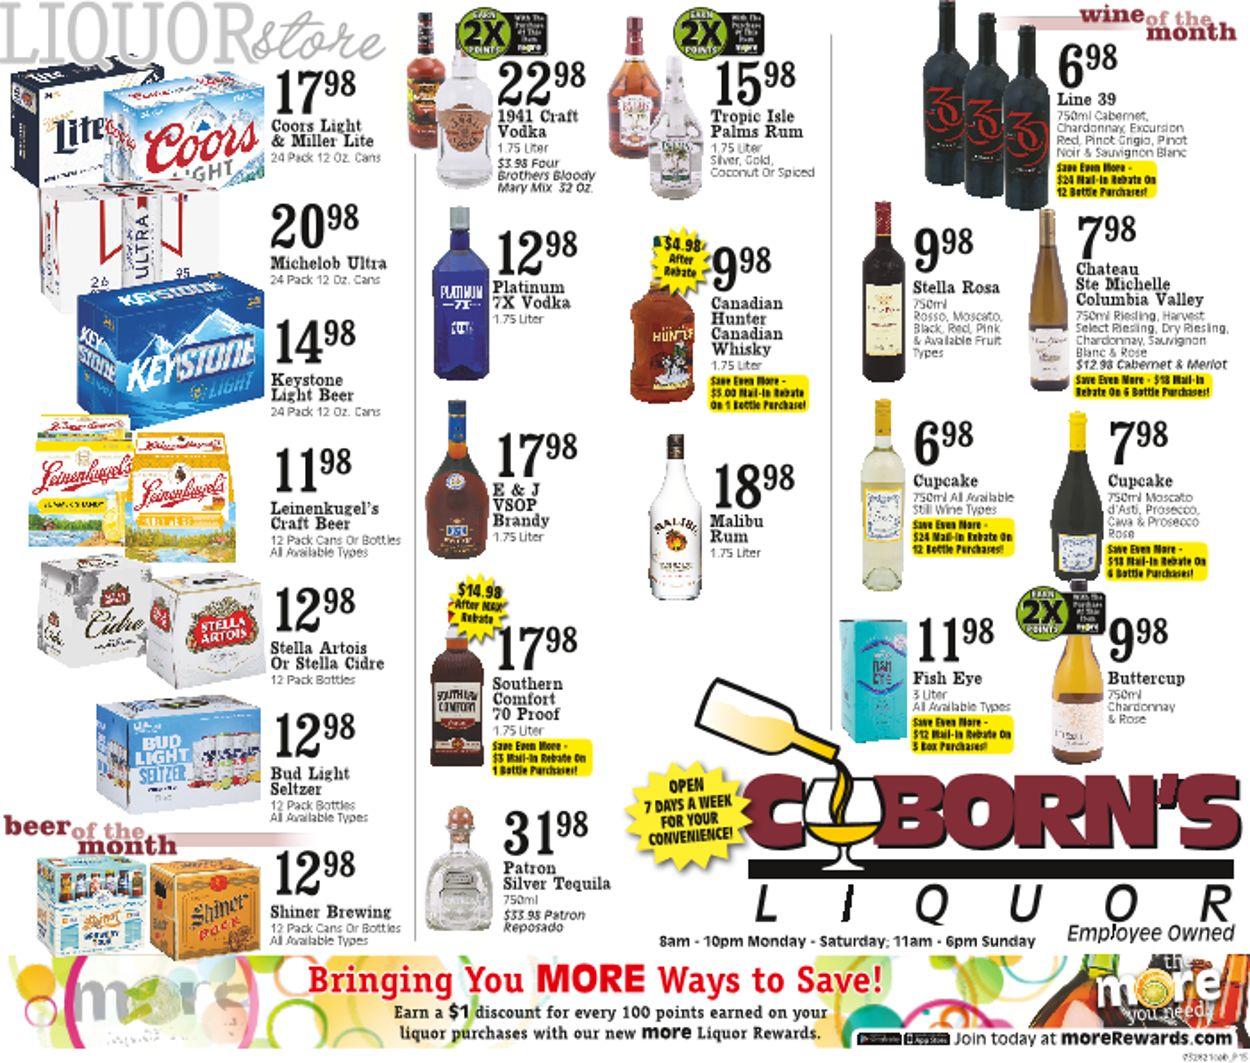 Coborn's Weekly Ad Circular - valid 03/31-04/06/2021